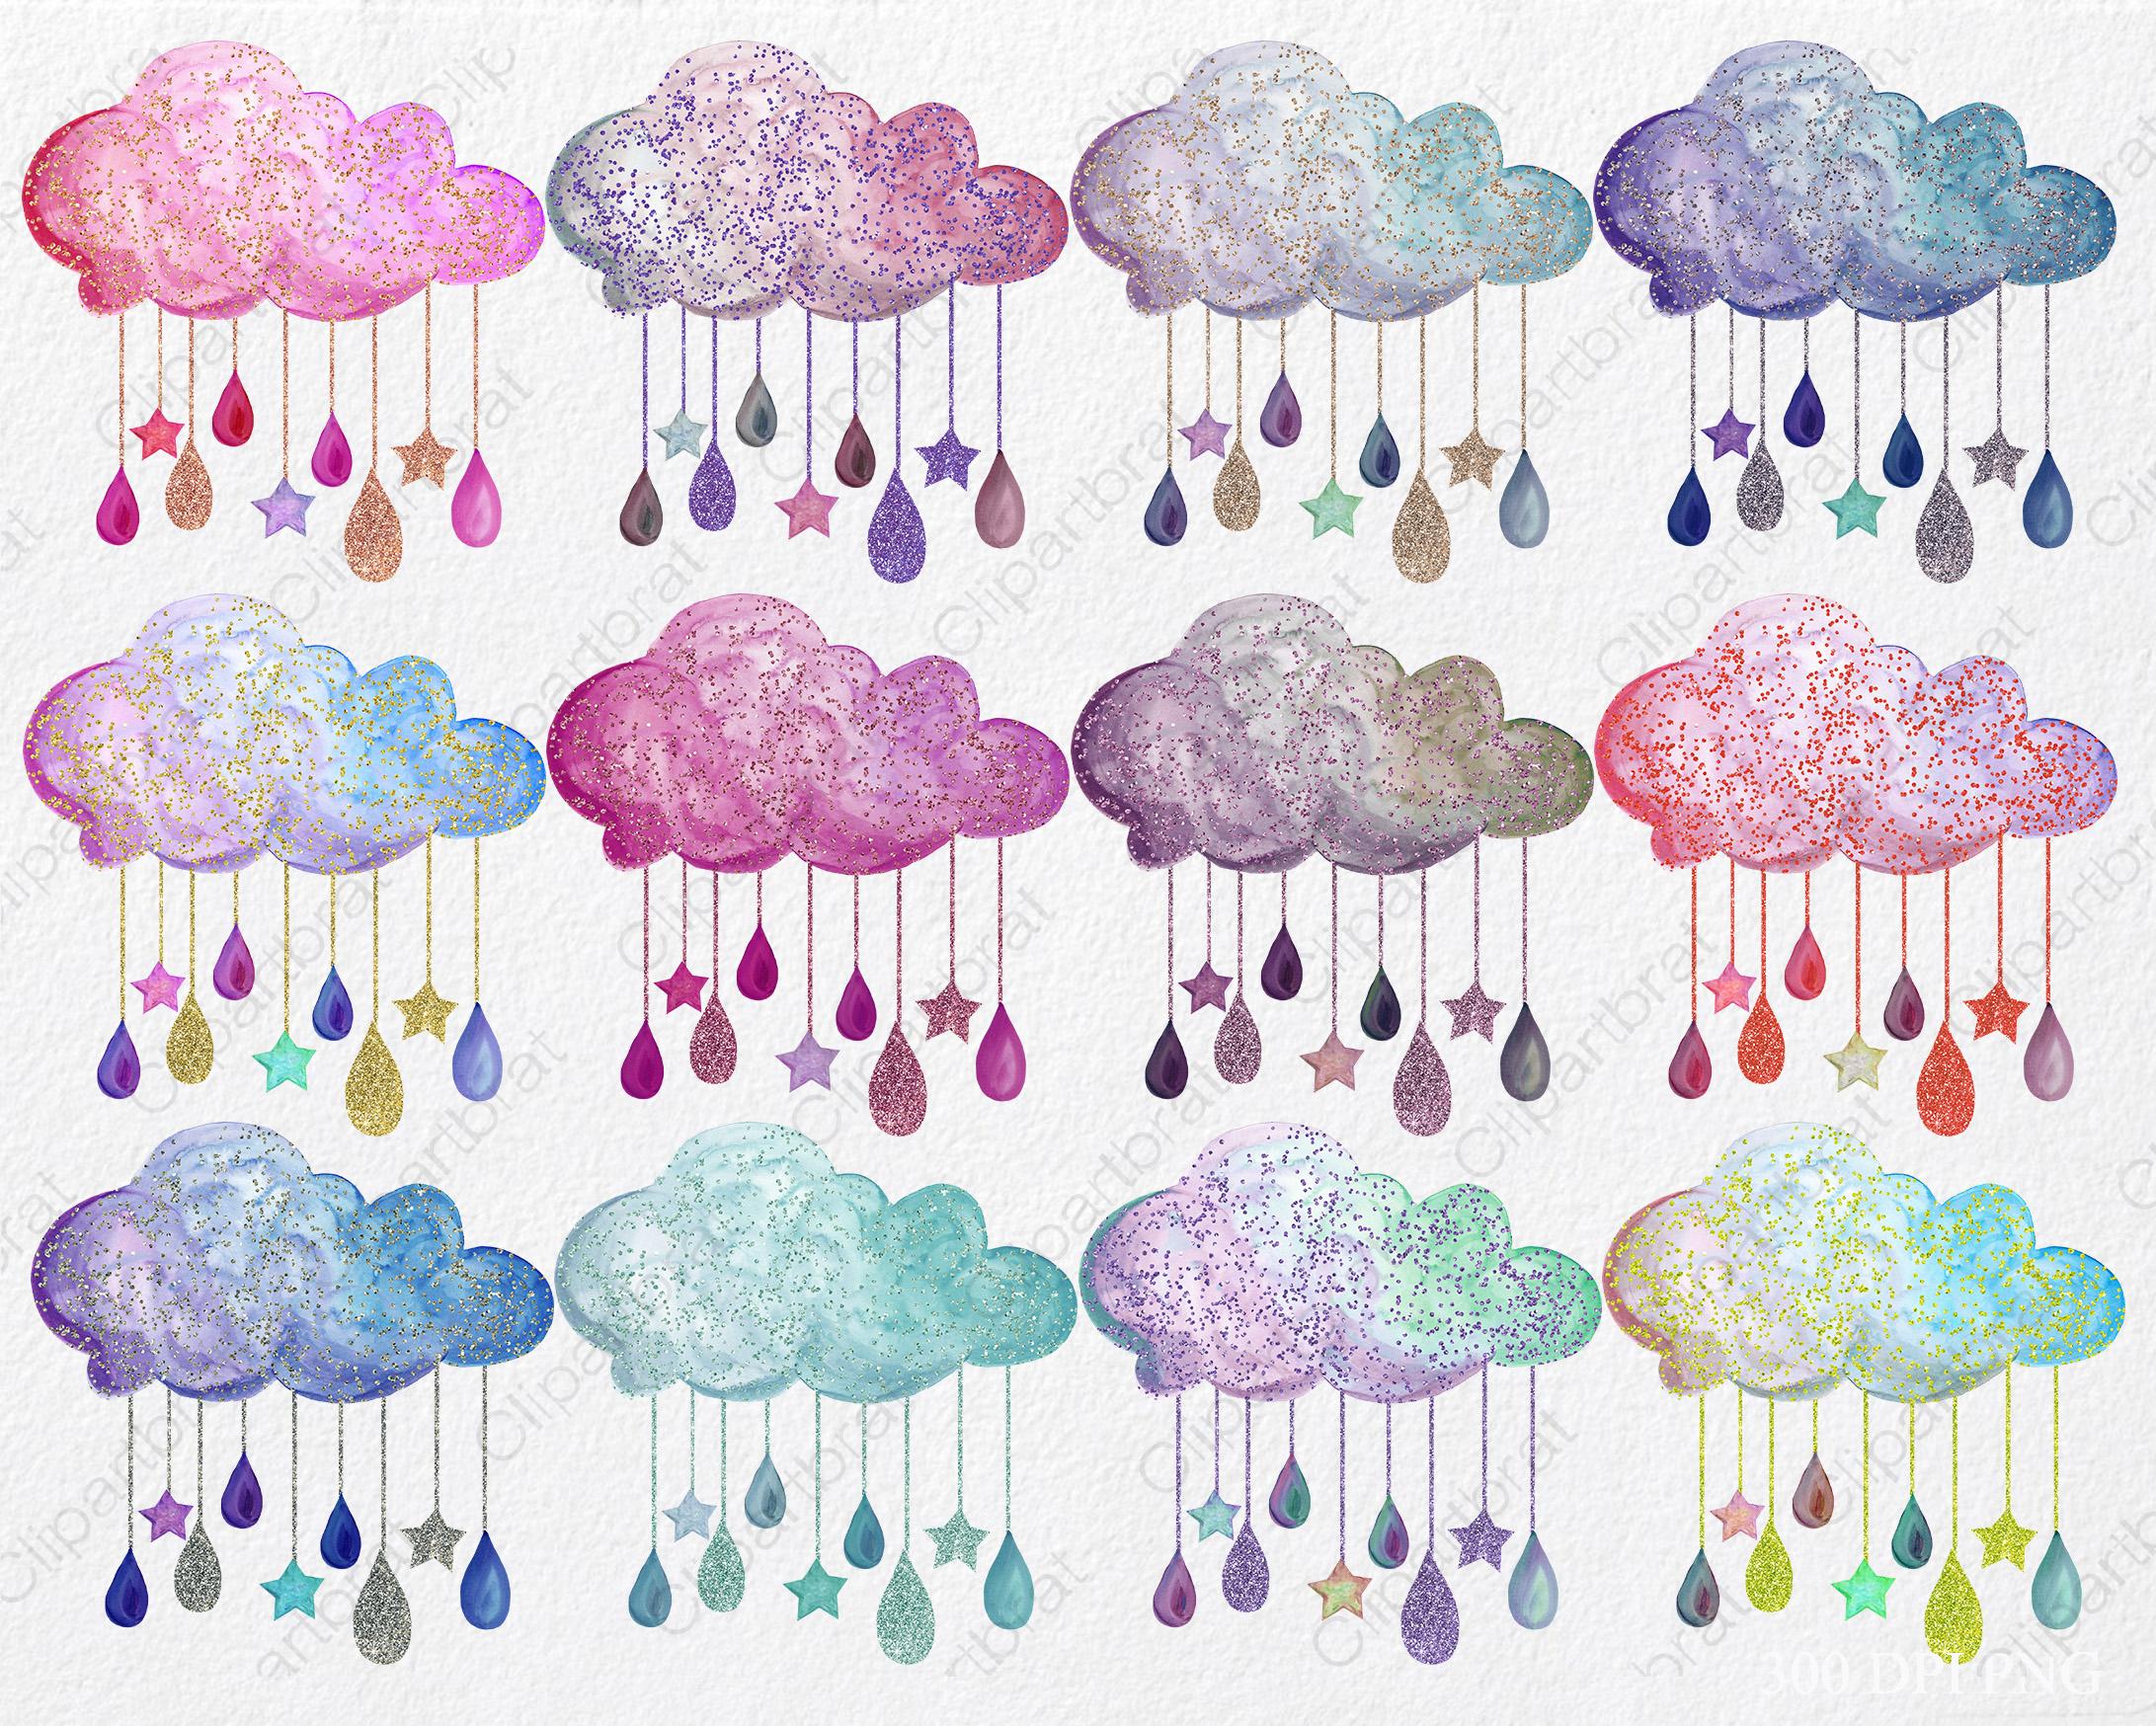 Cute Rainbow Watercolor Rain Clouds & Rain Drops with Metallic Gold Glitter Confetti Baby Shower Clipart Nursery Graphics Set example image 2